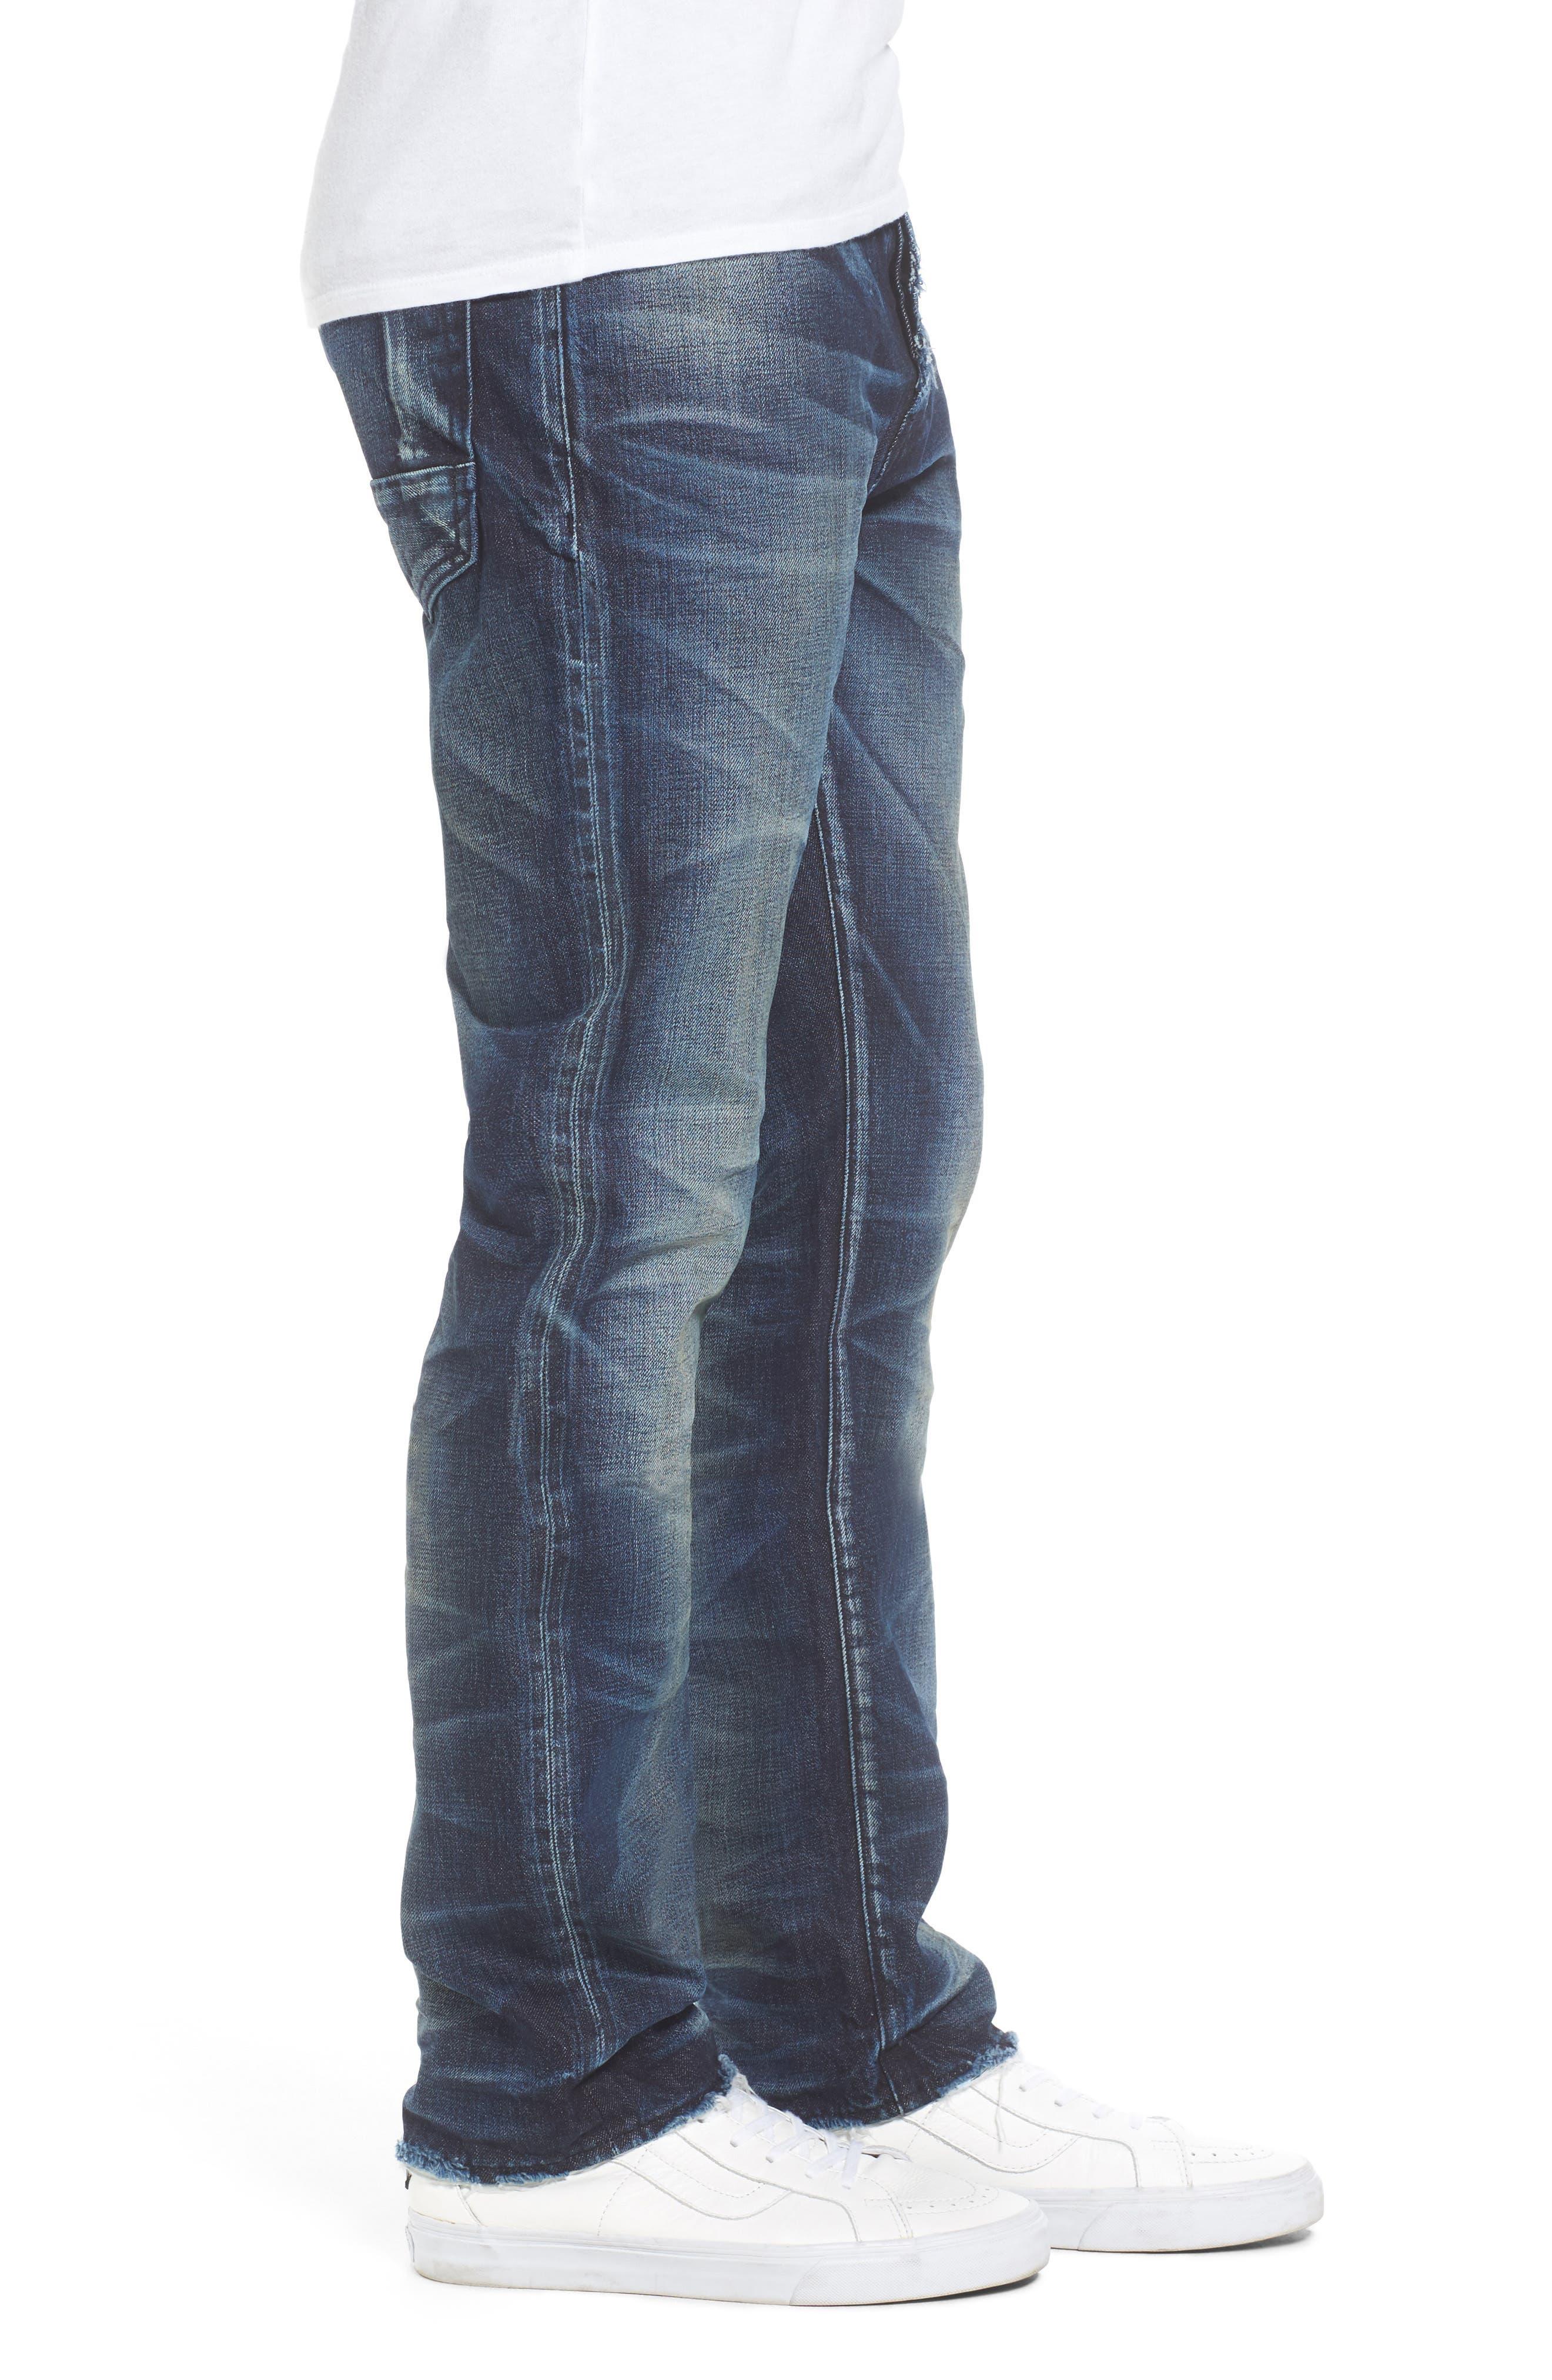 Demon Slim Straight Jeans,                             Alternate thumbnail 3, color,                             INDIGO